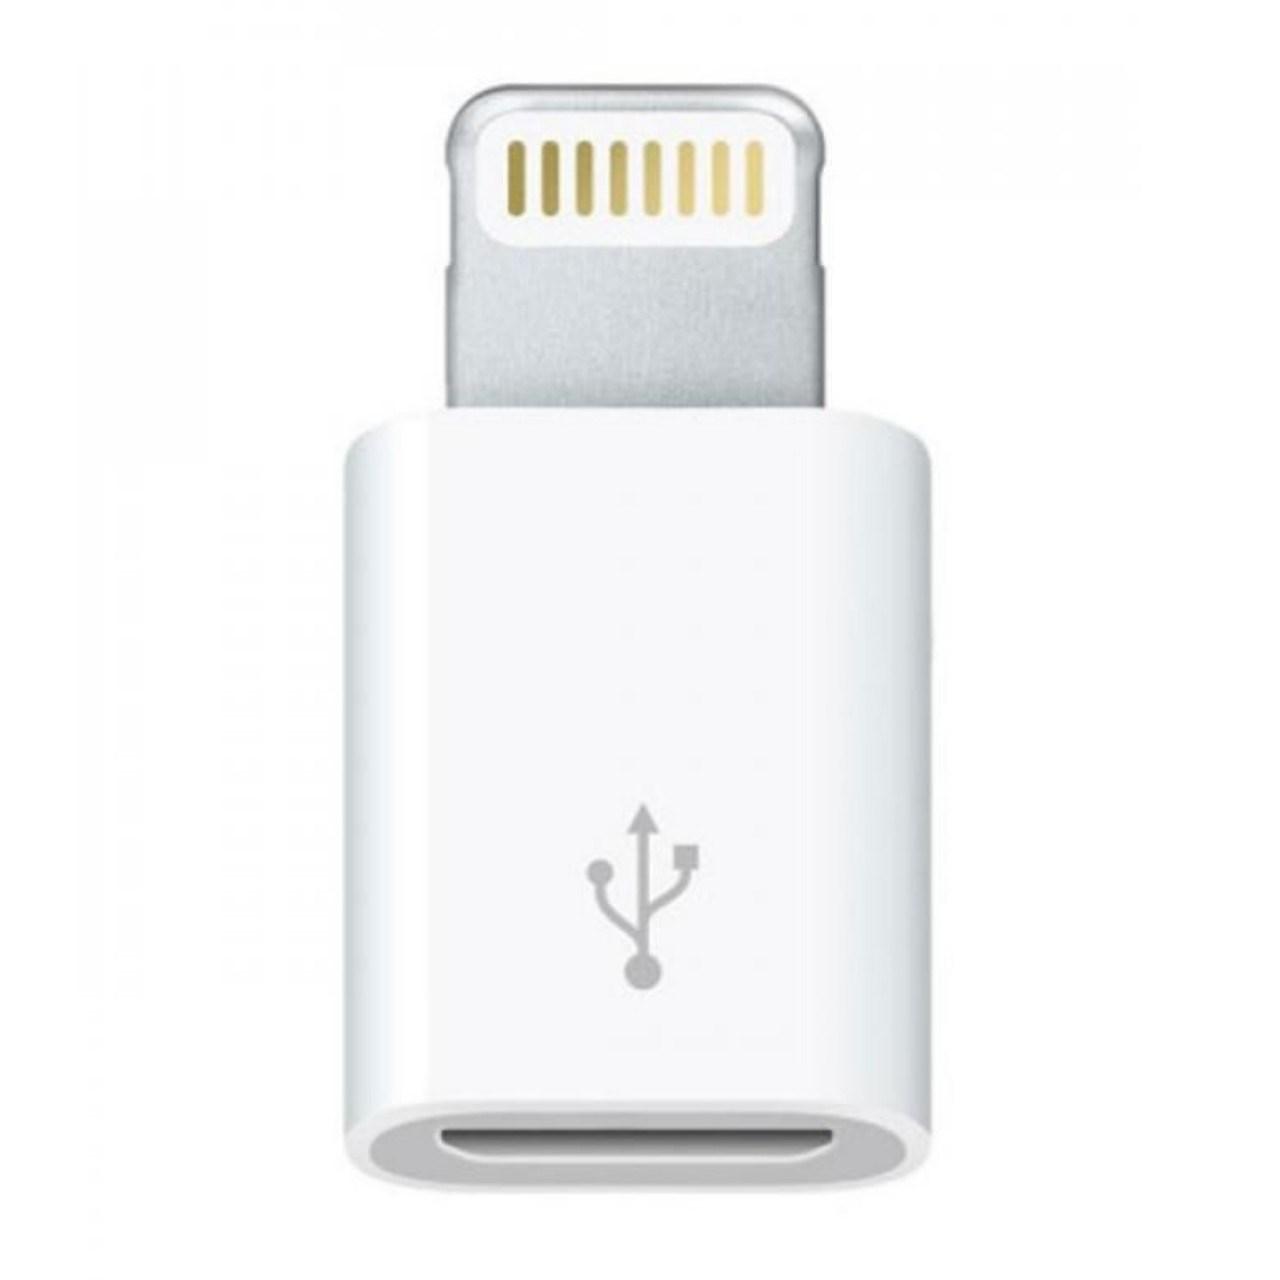 تبدیل micro USB به لایتنینگ مدل lightning adapter